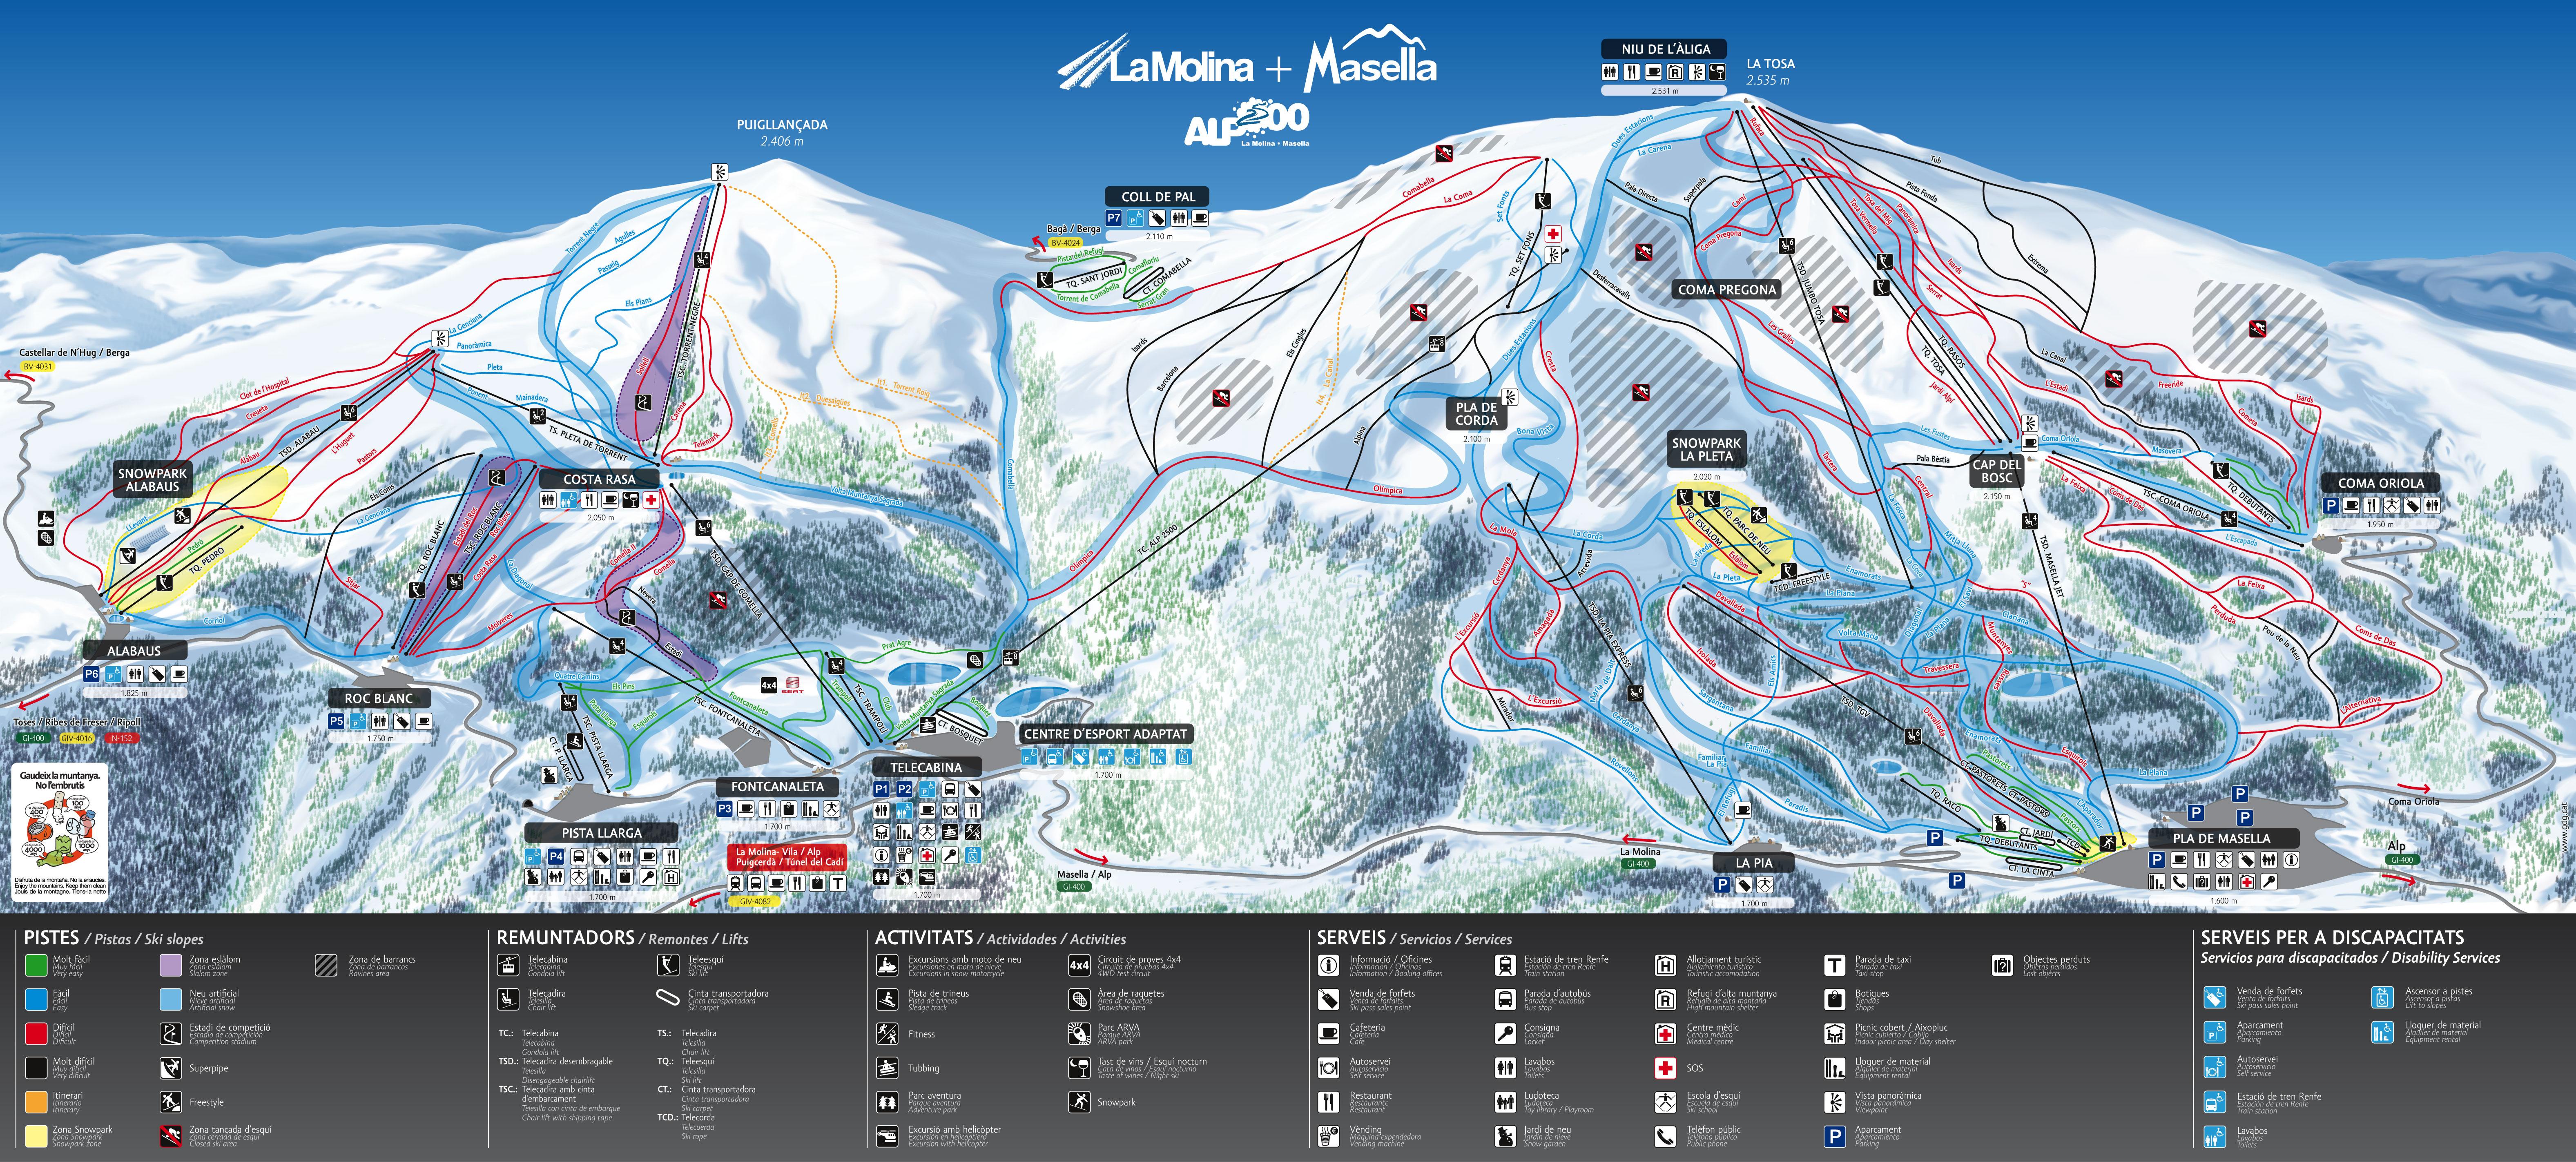 planol_pistes_molina-masella_finalllegenda_2